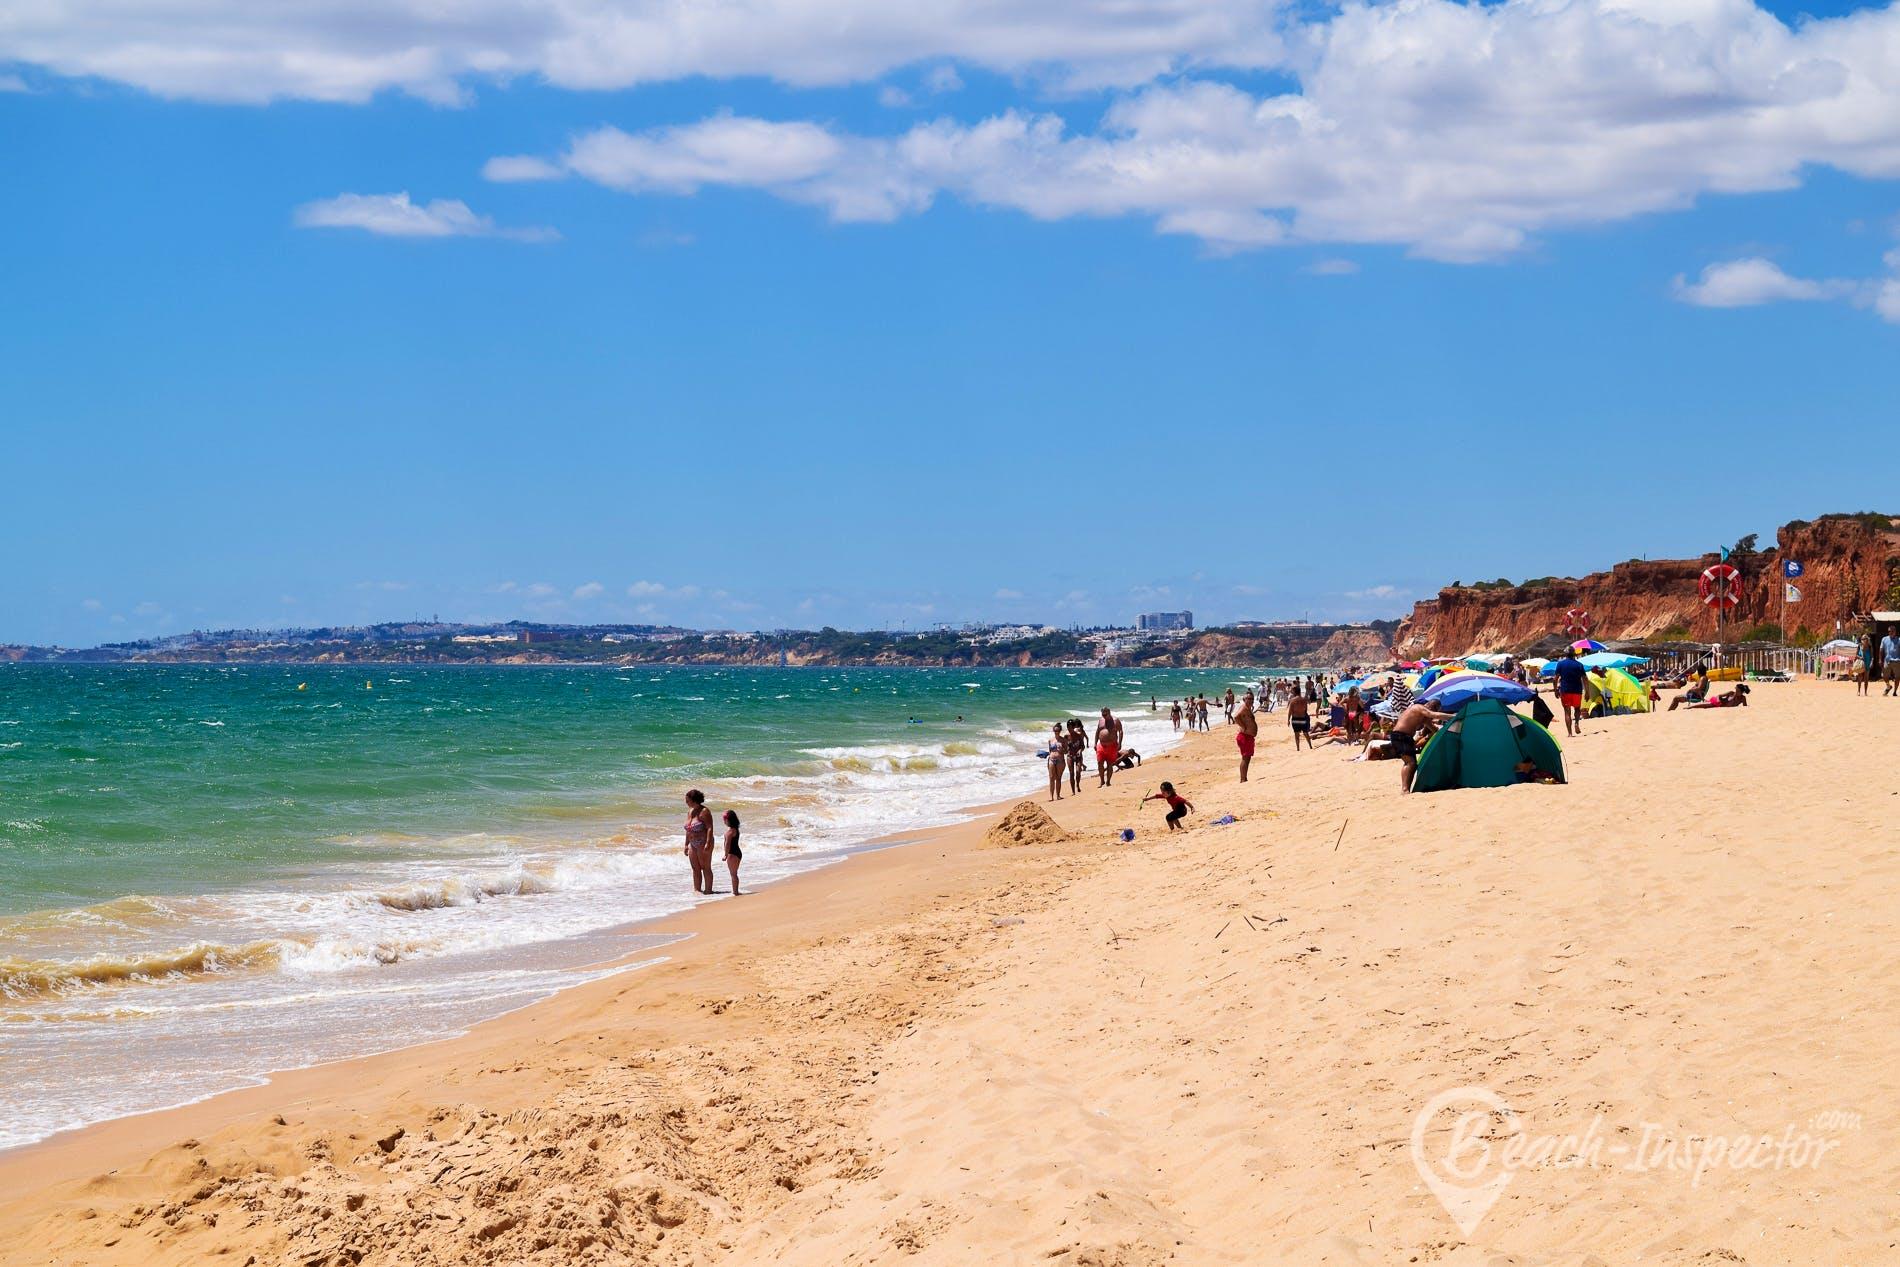 Beach Praia da Falésia Alfamar, Algarve, Portugal